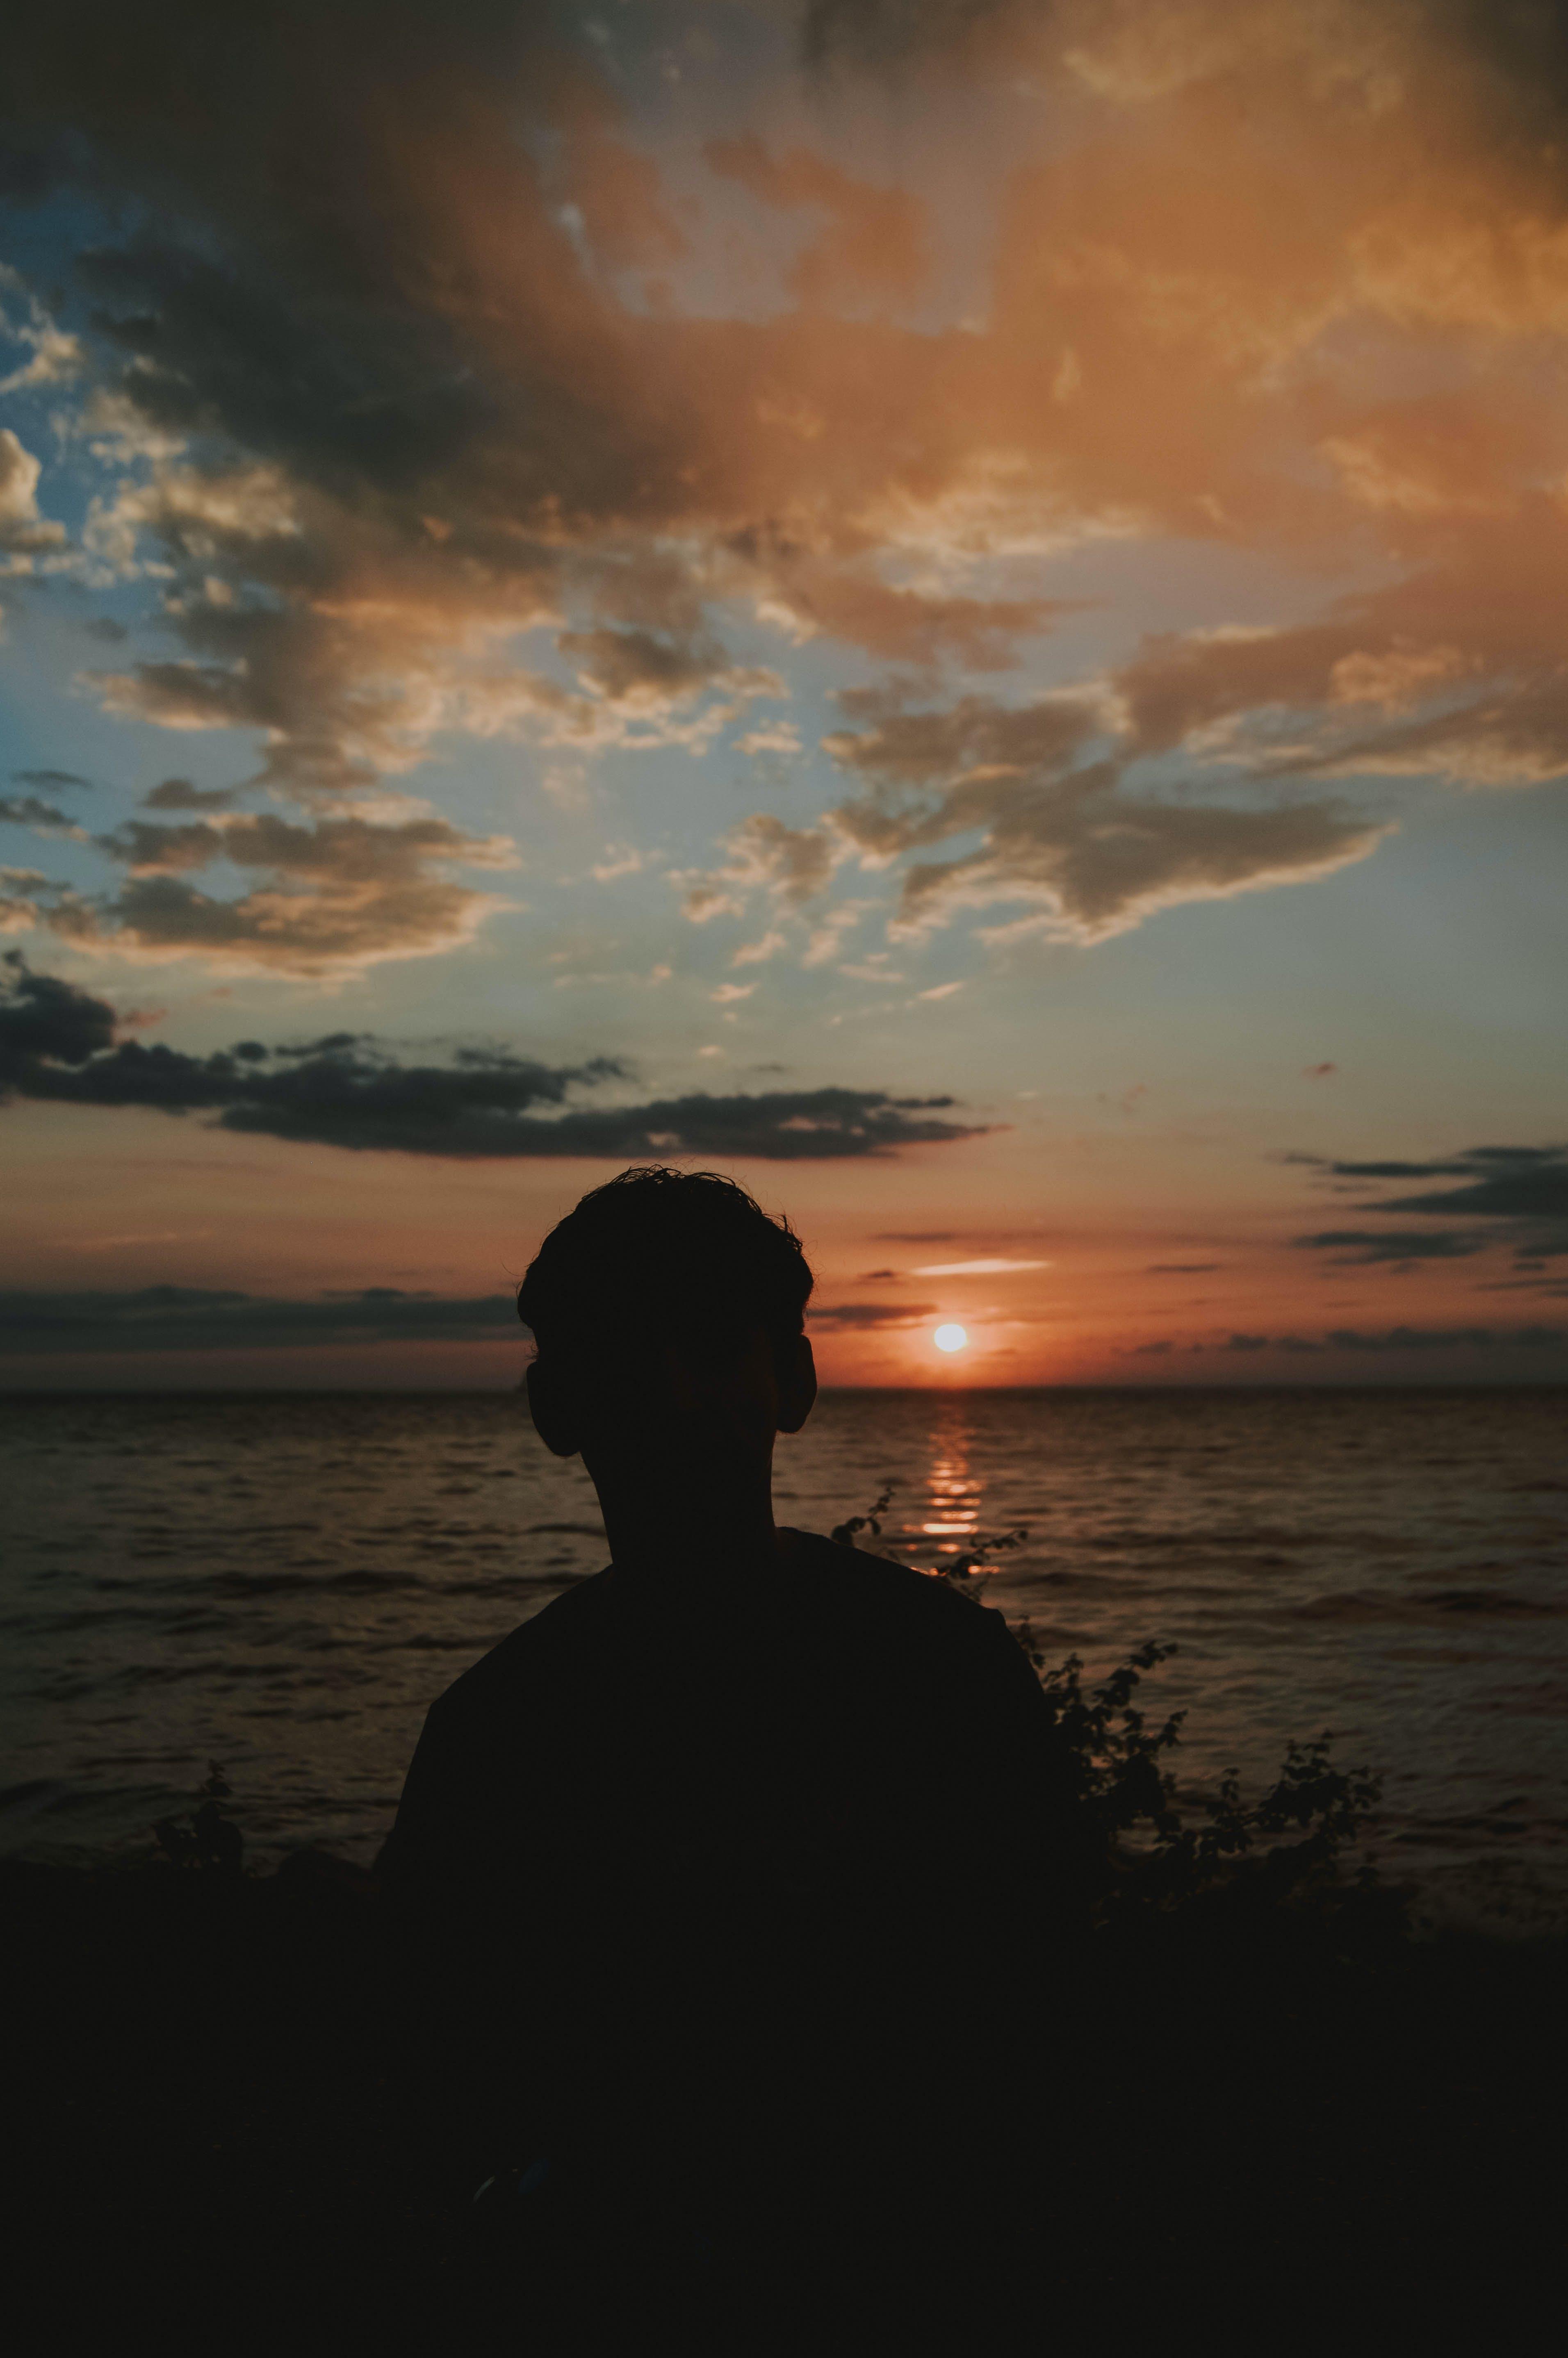 Free stock photo of sea, sunset, man, clouds